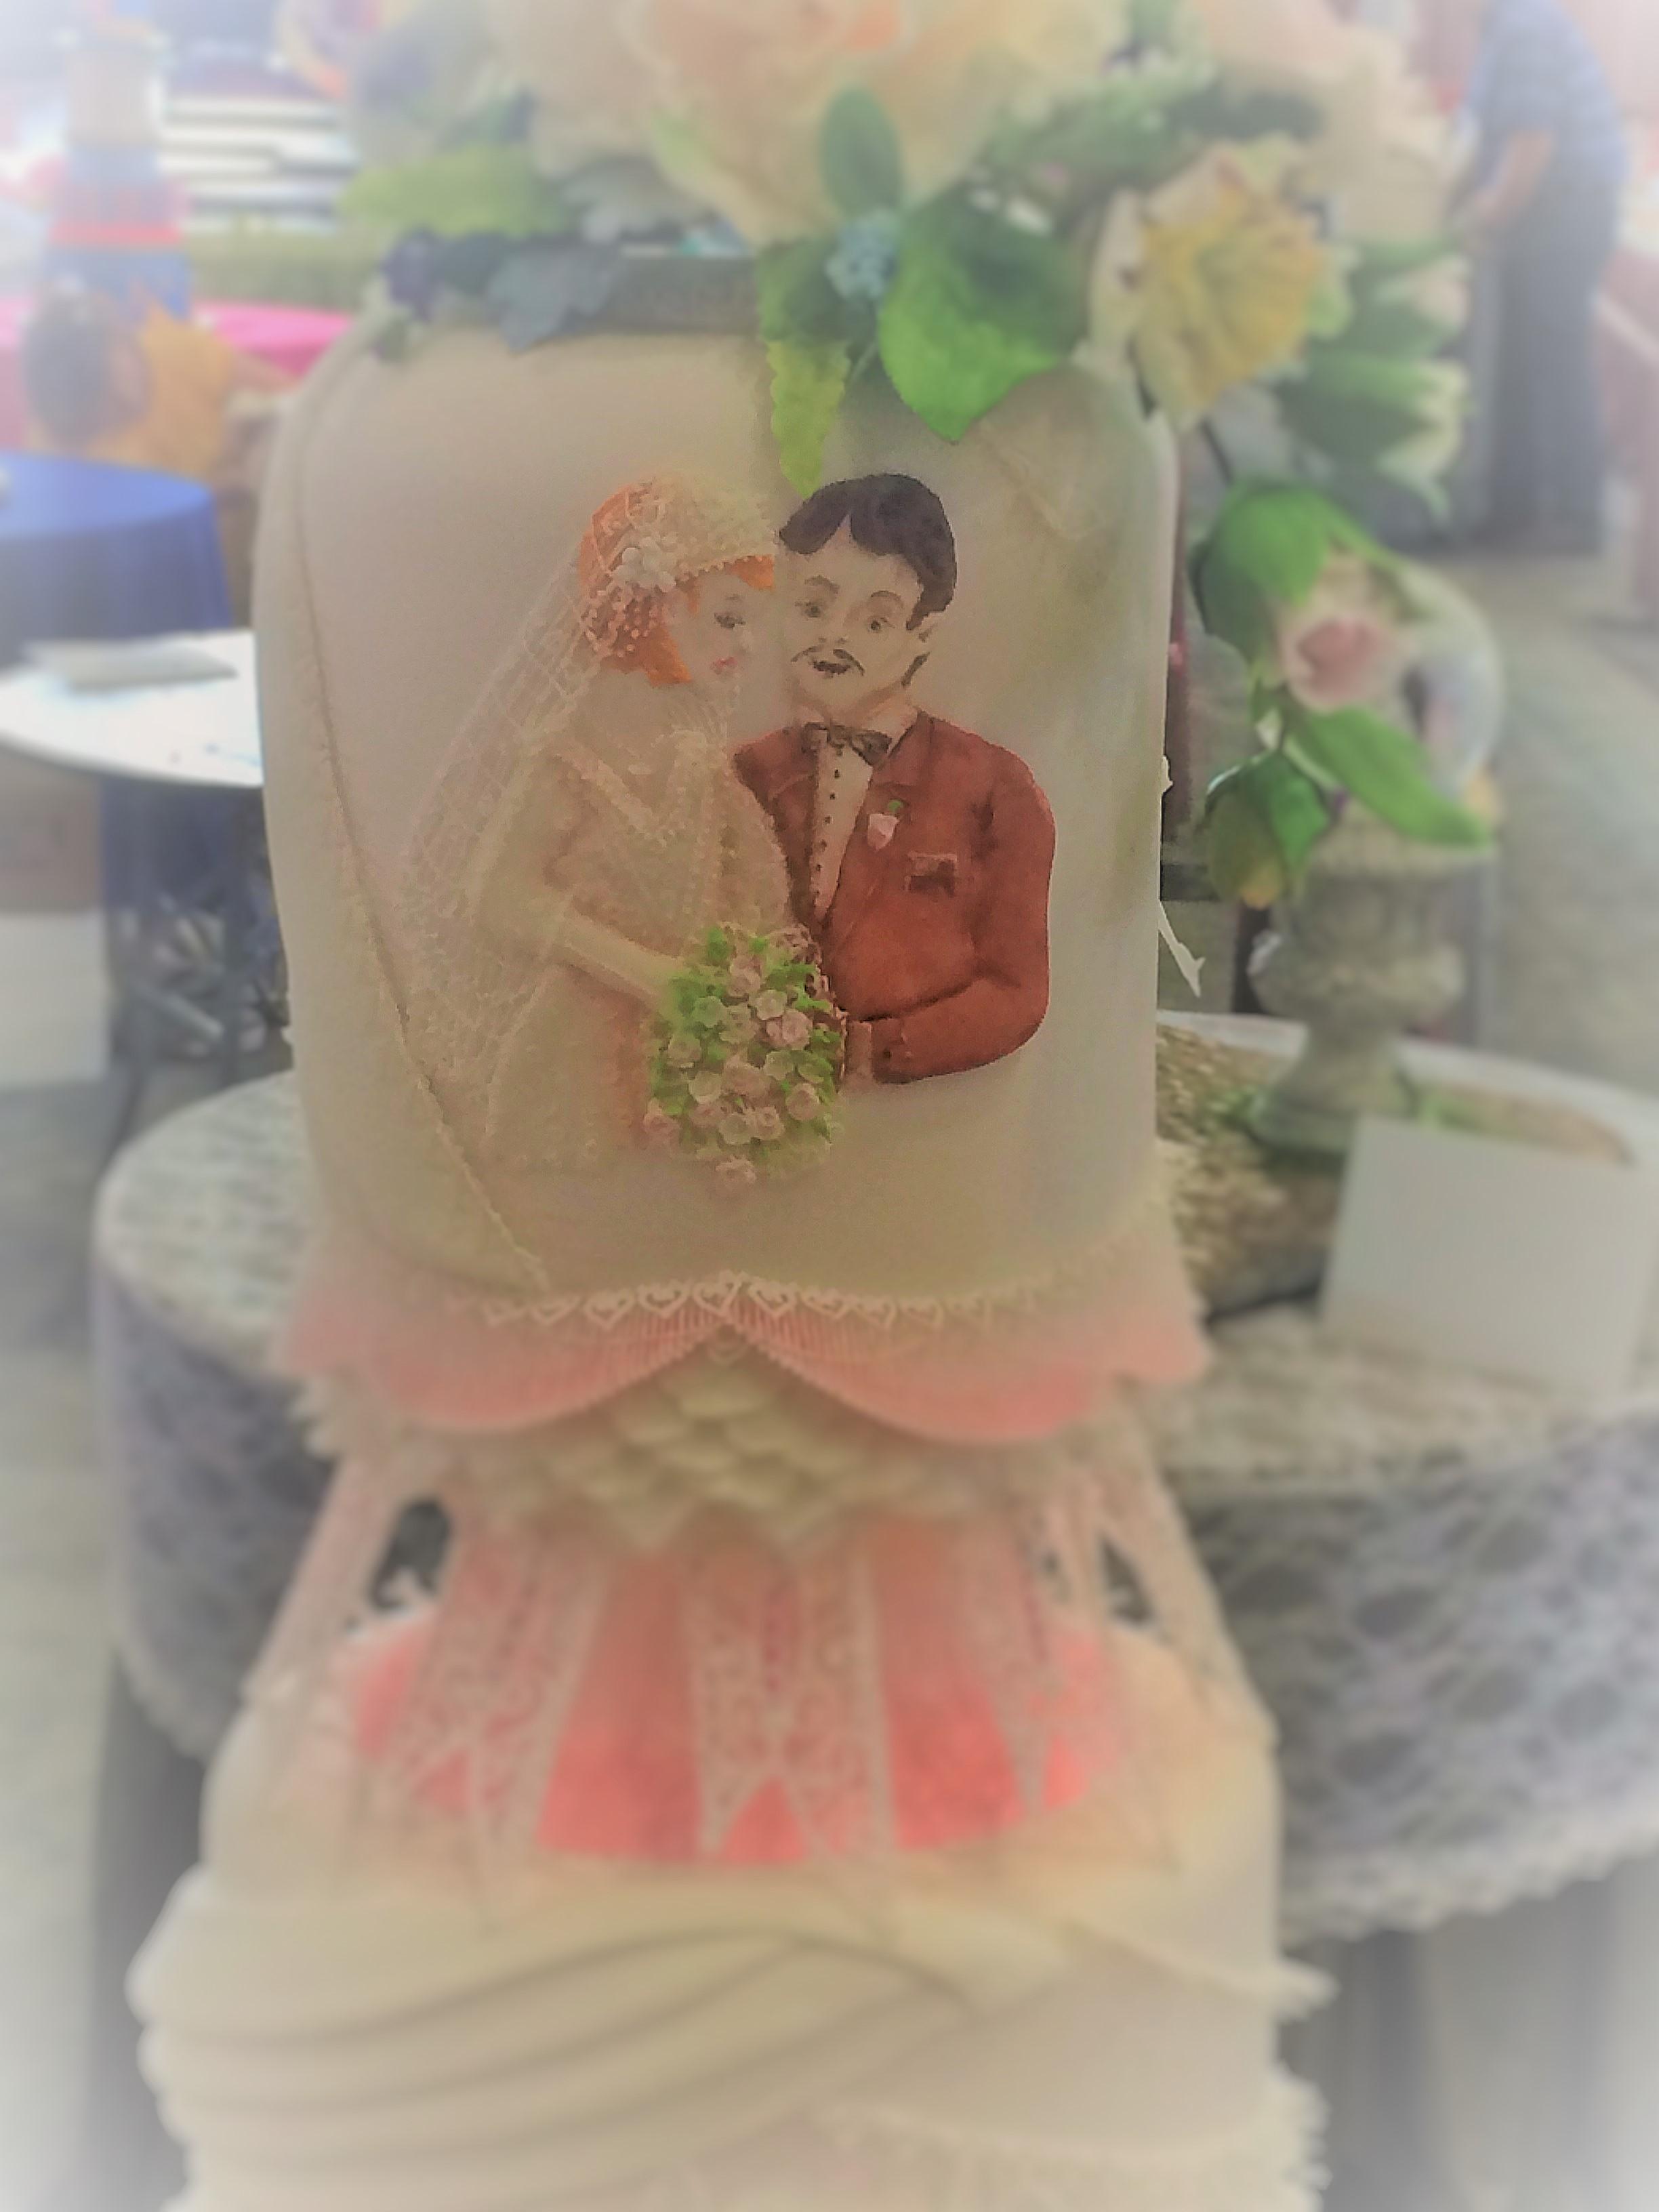 Wedding Cakes Shayne Greenman - Wedding Cakes 2014